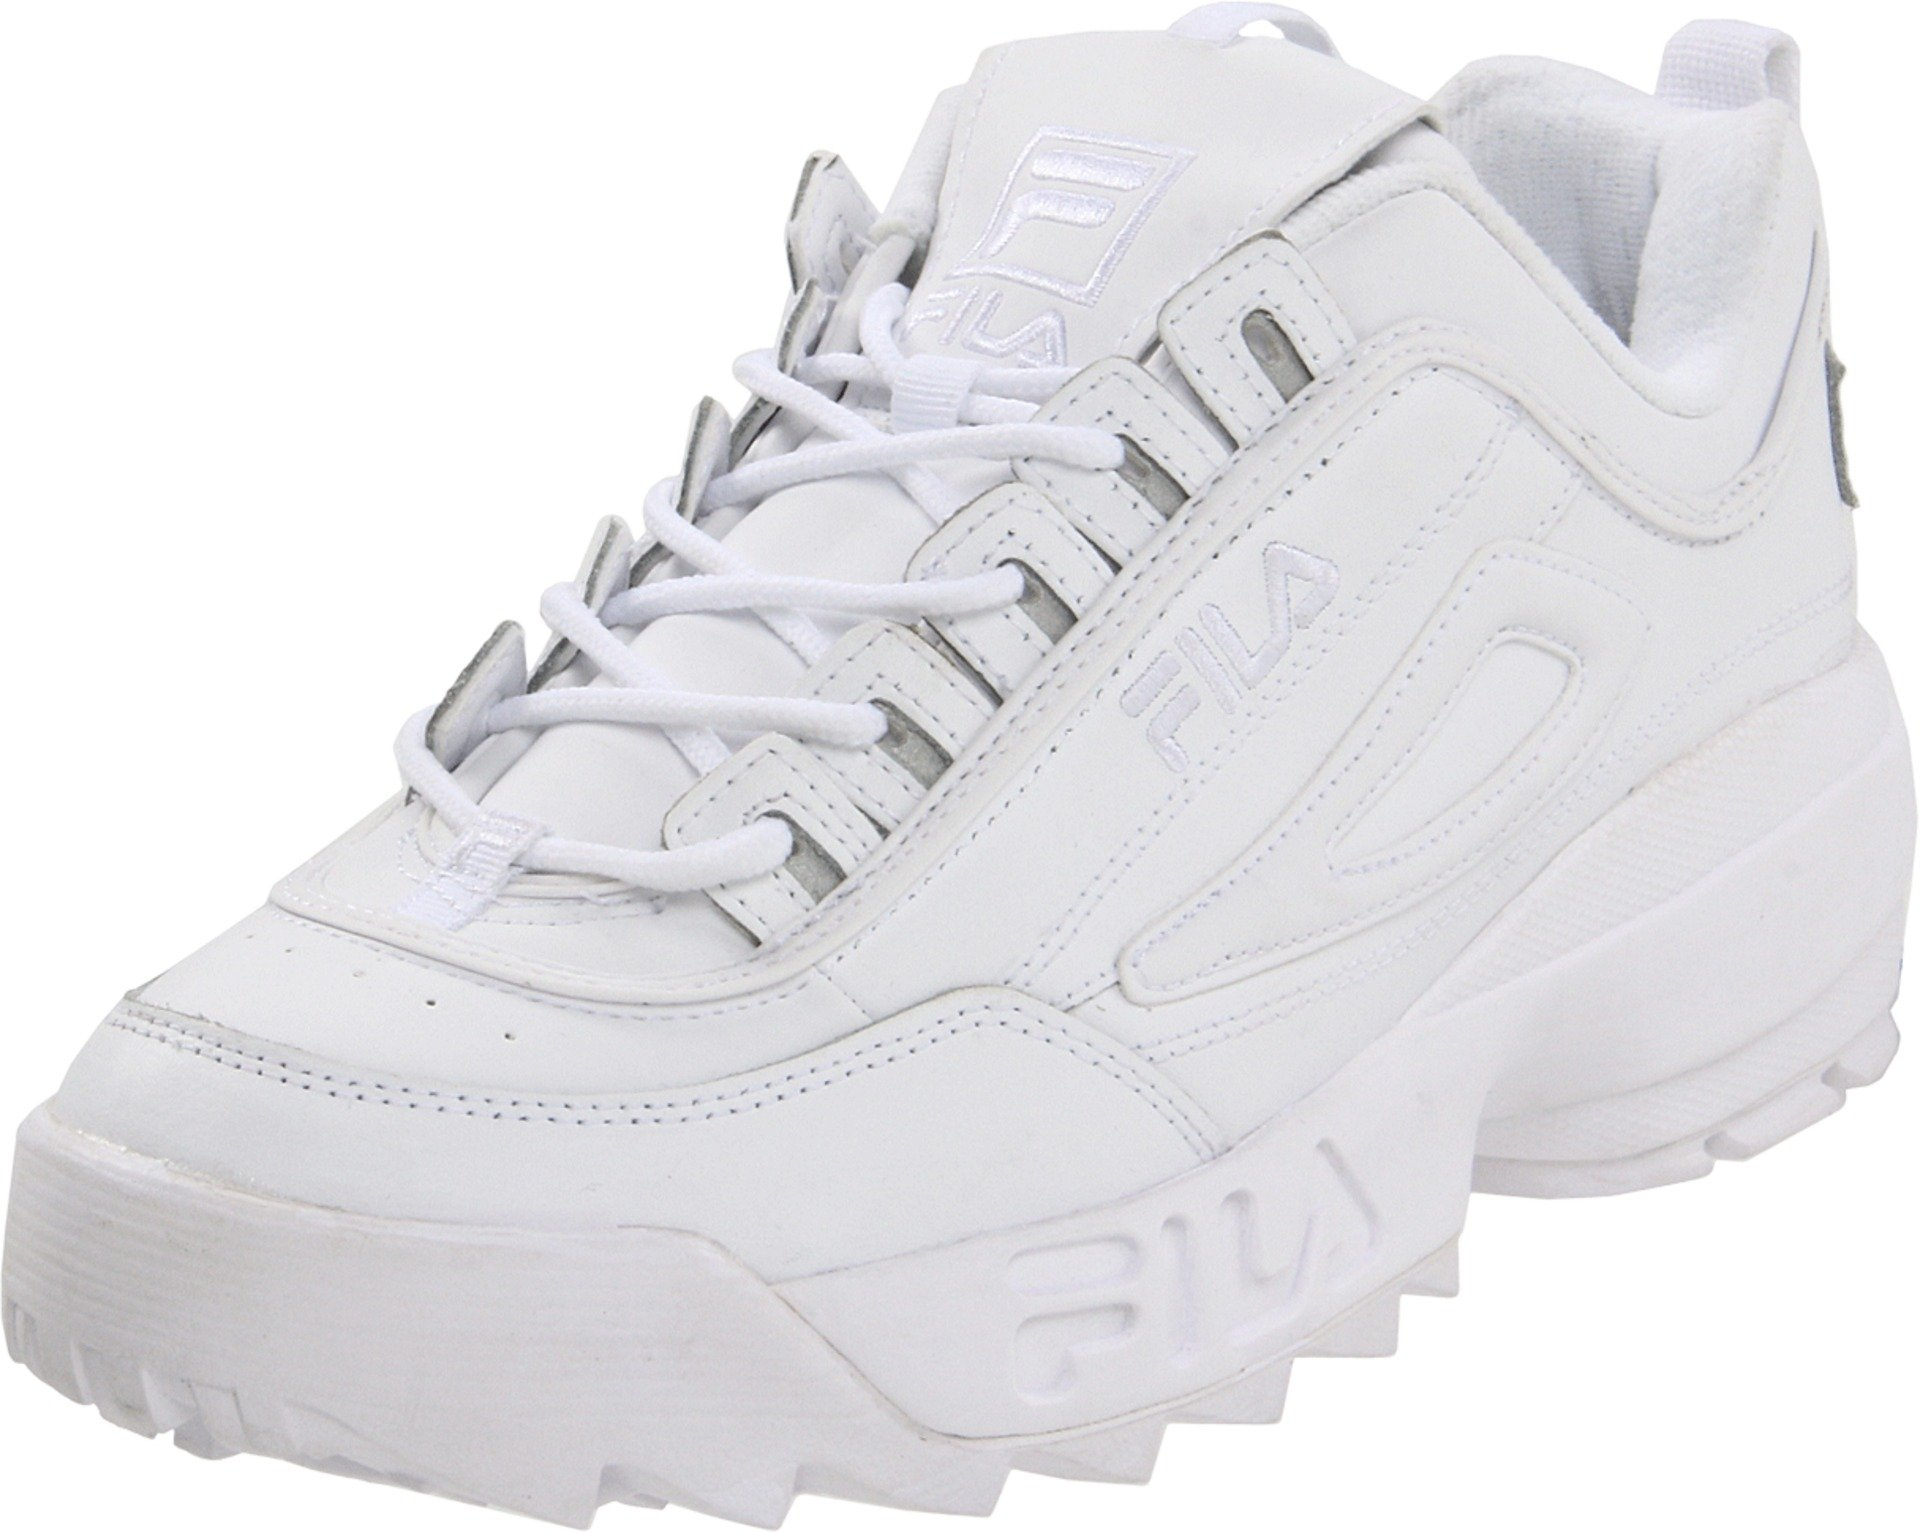 Fila Fila FW04495 FW01655 FW01653 Men's Classic Disruptor II Sneakers All Colors (7 D(M) US Men, Triple White)